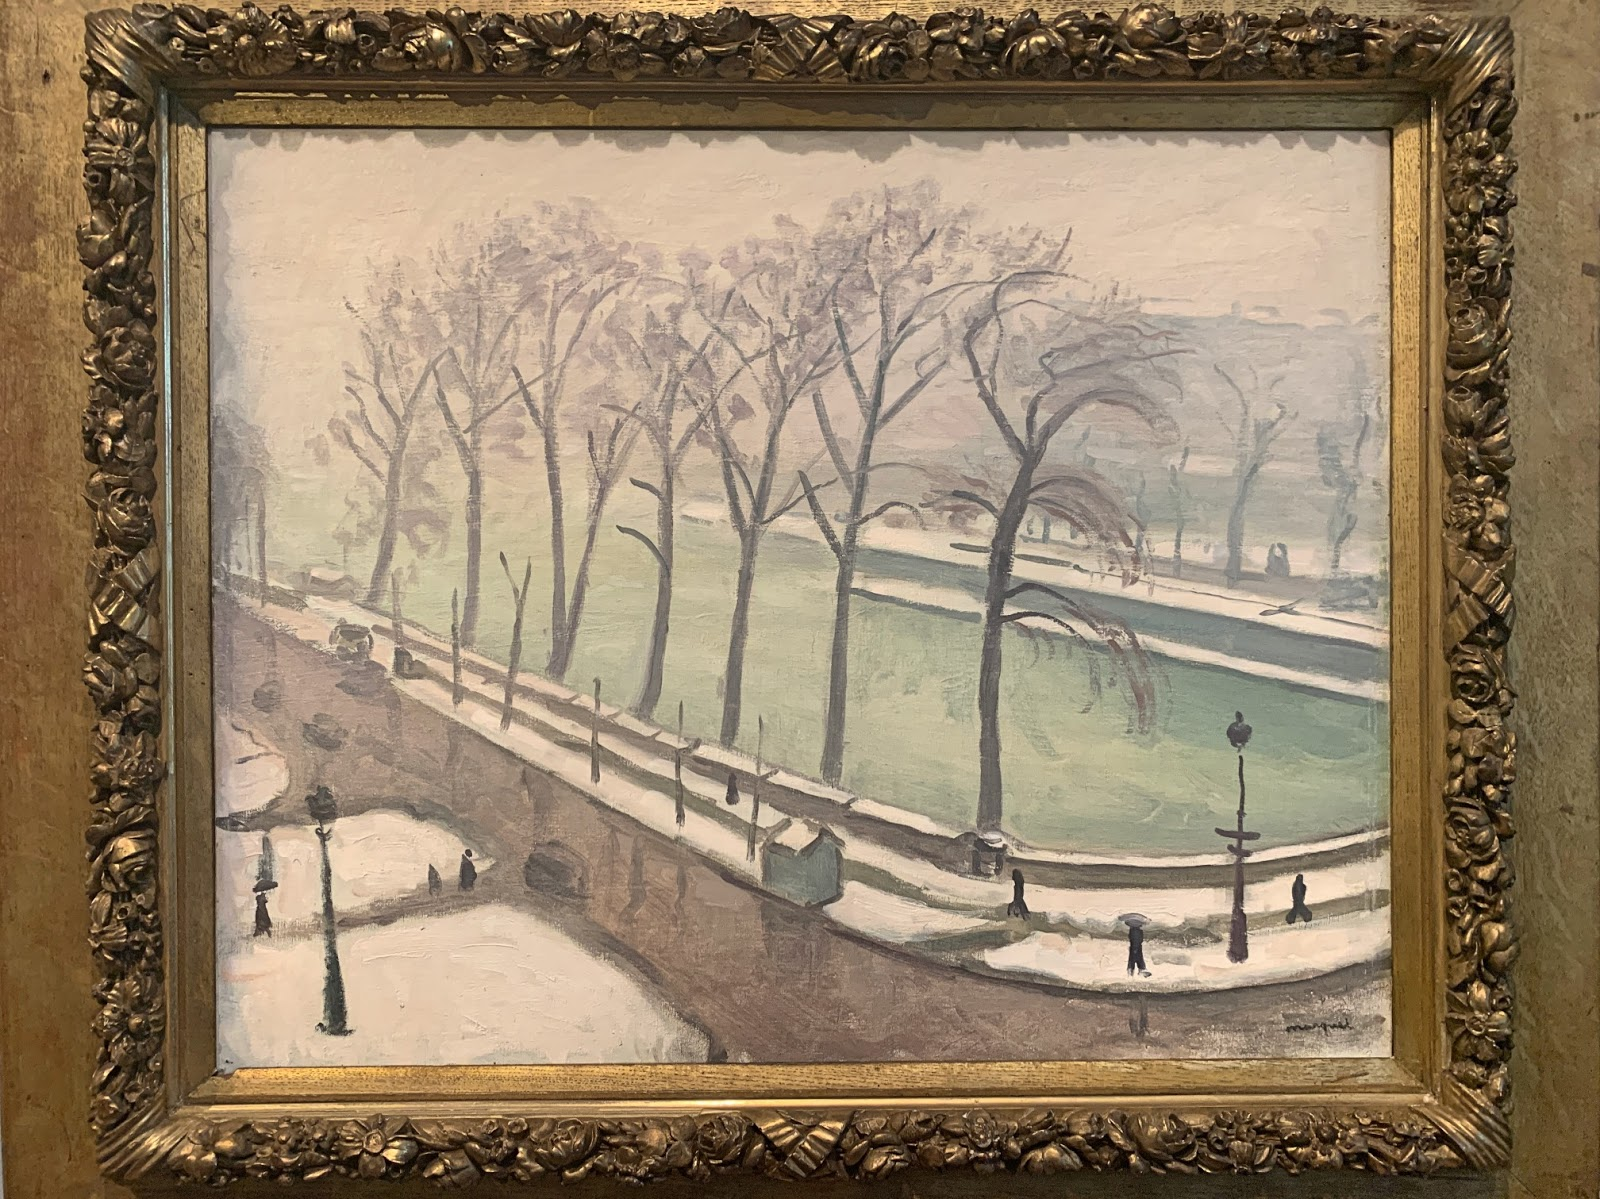 Albert Marquet, postimpresjonizm, fowizm, Pont-Neuf pod śniegiem